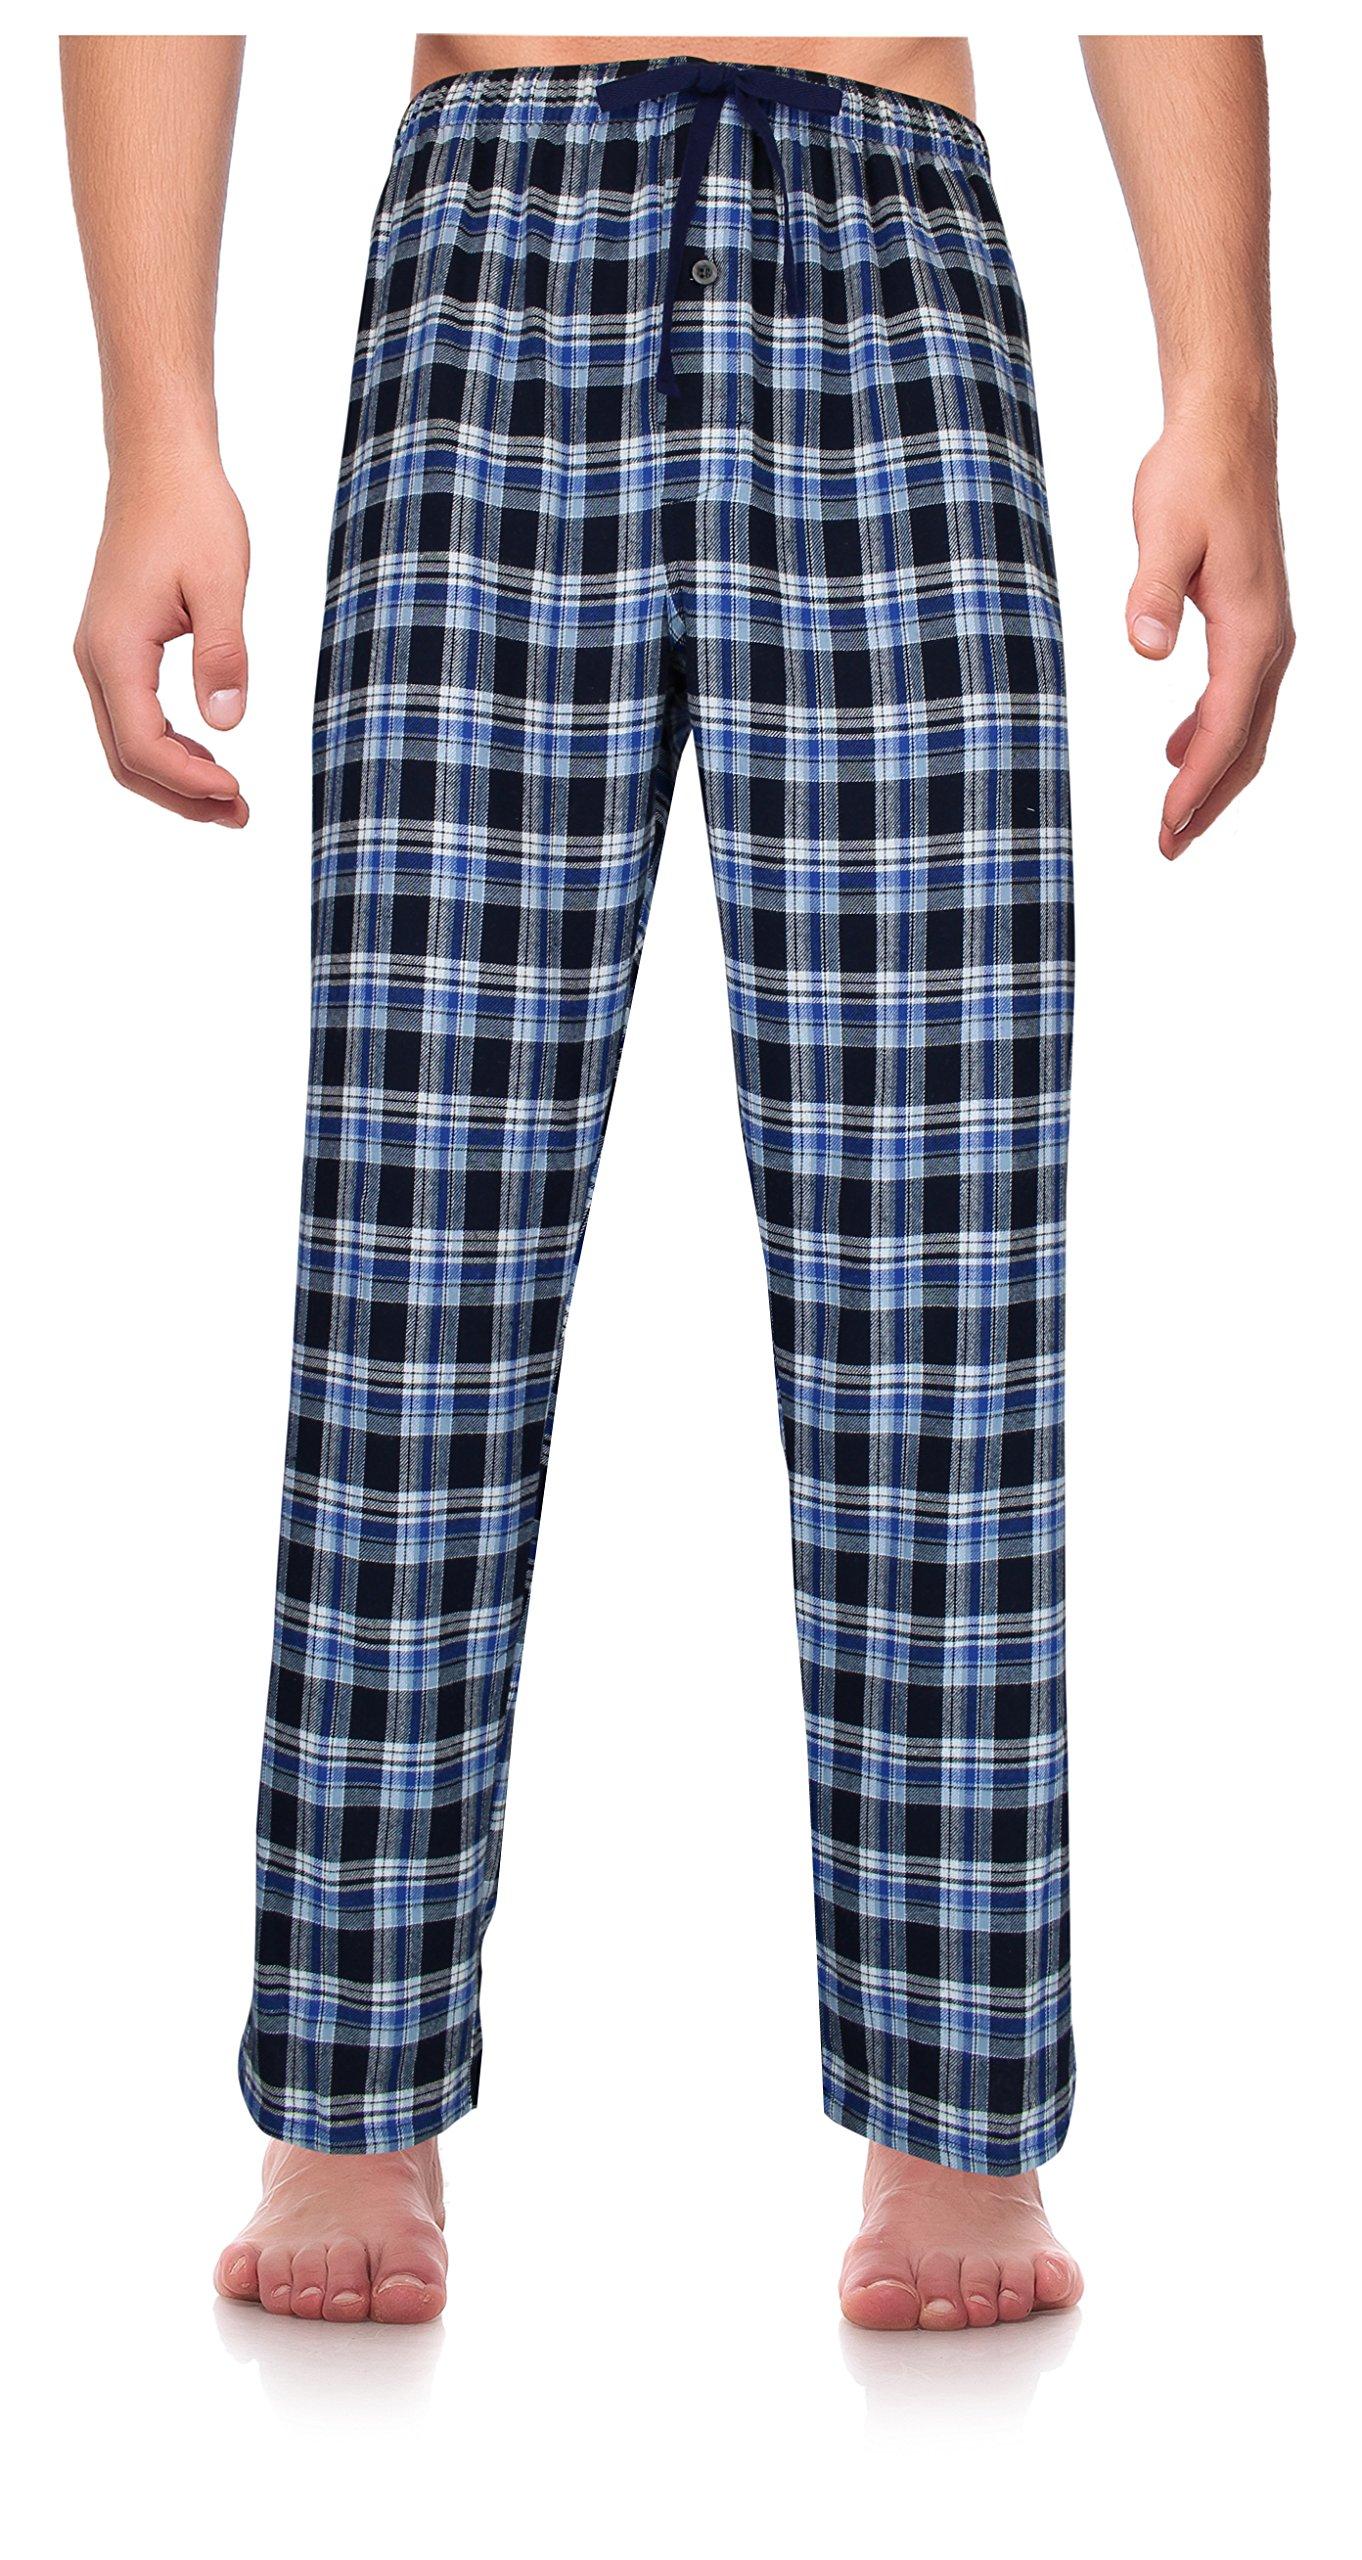 RK Classical Sleepwear Men's 100% Cotton Flannel Pajama Pants,Blue, Plaid (F0161),Medium